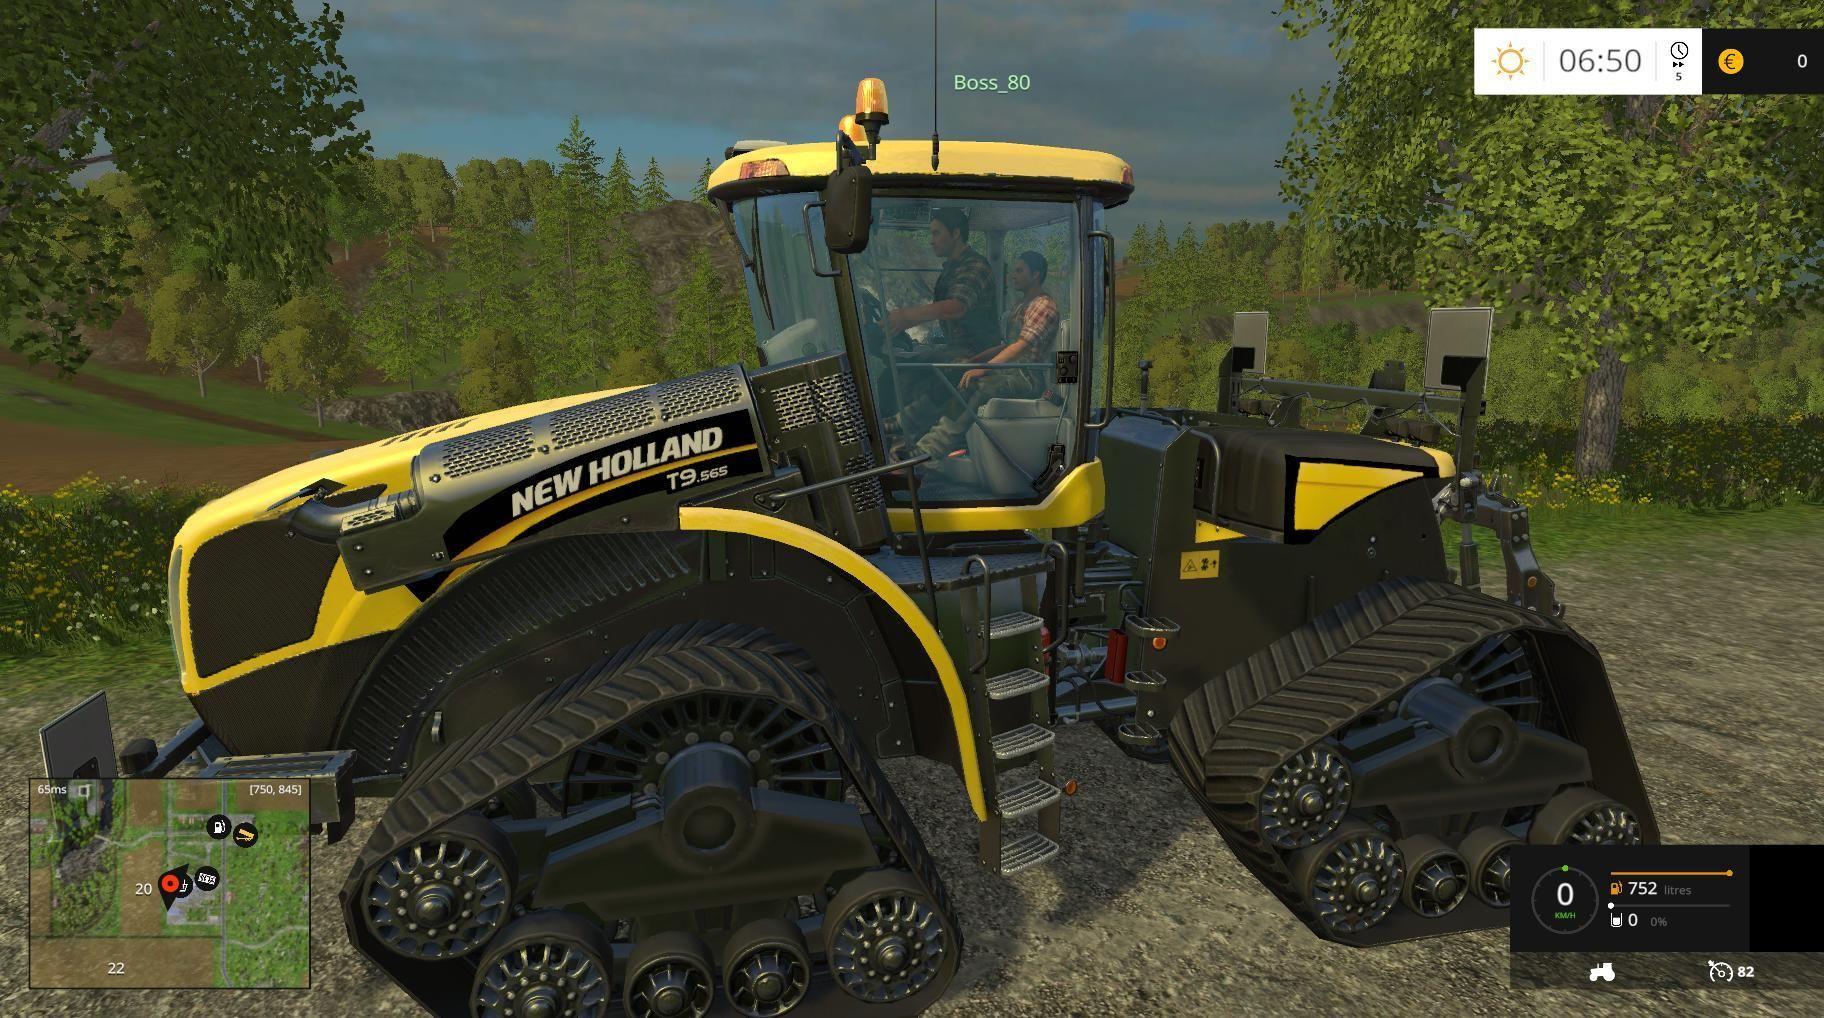 new holland smarttrax tractor v1 0 farming. Black Bedroom Furniture Sets. Home Design Ideas